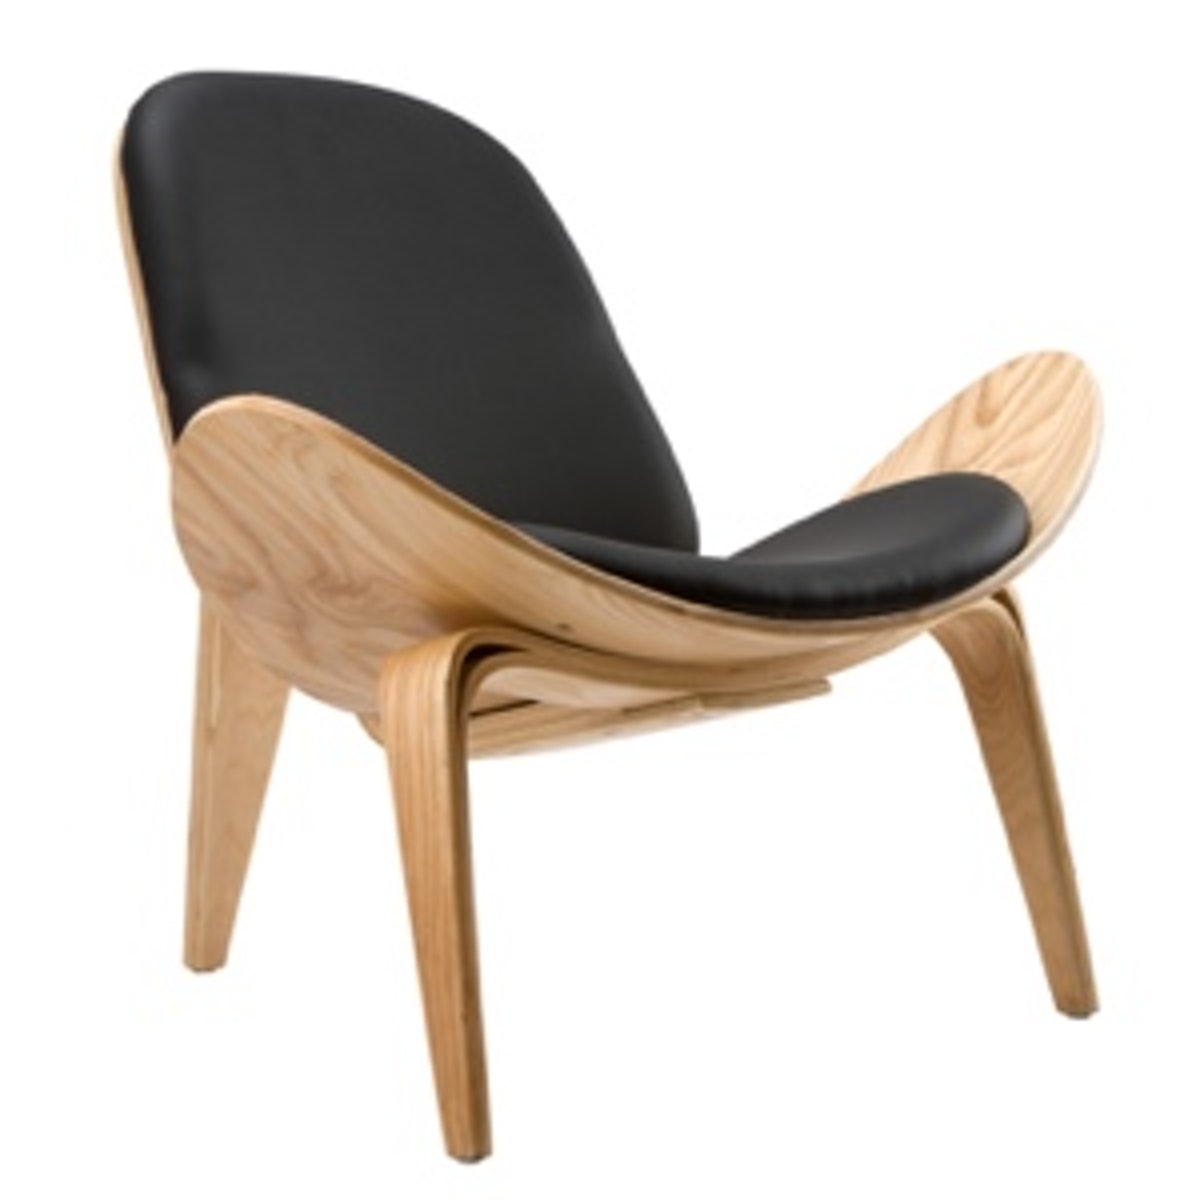 Wings Chair in Natural Black